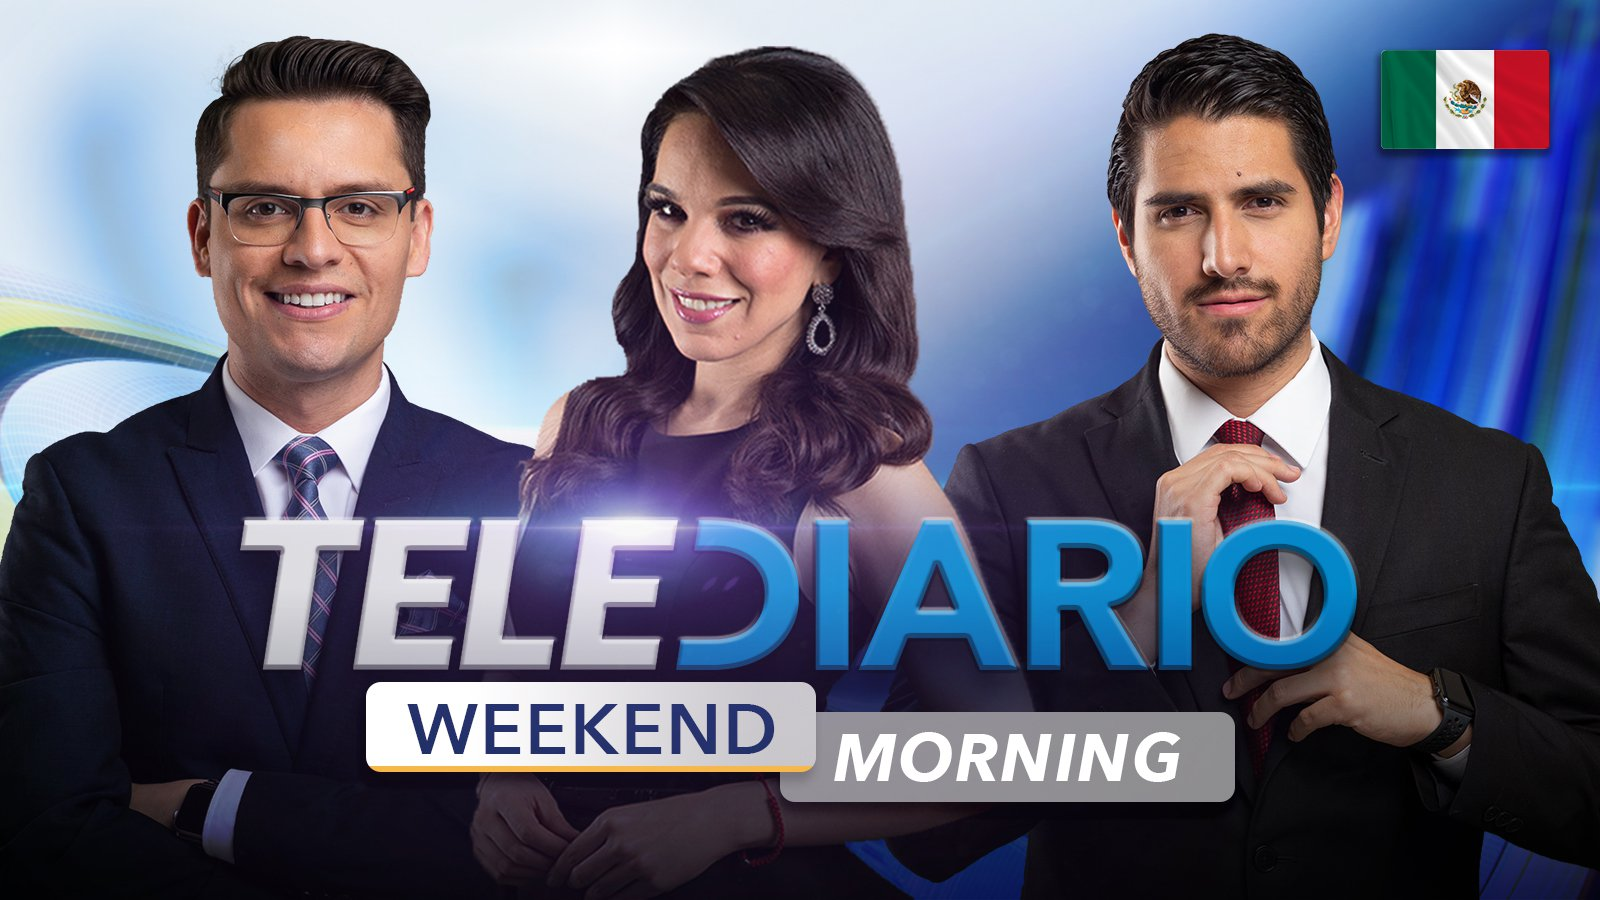 Weekend Morning Telediario poster